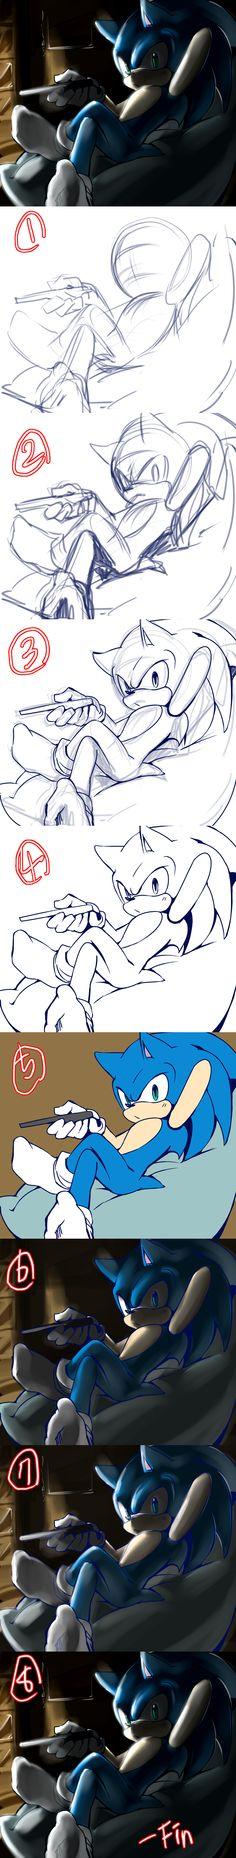 process by Lenmeu on deviantART Sonic's dynamic art